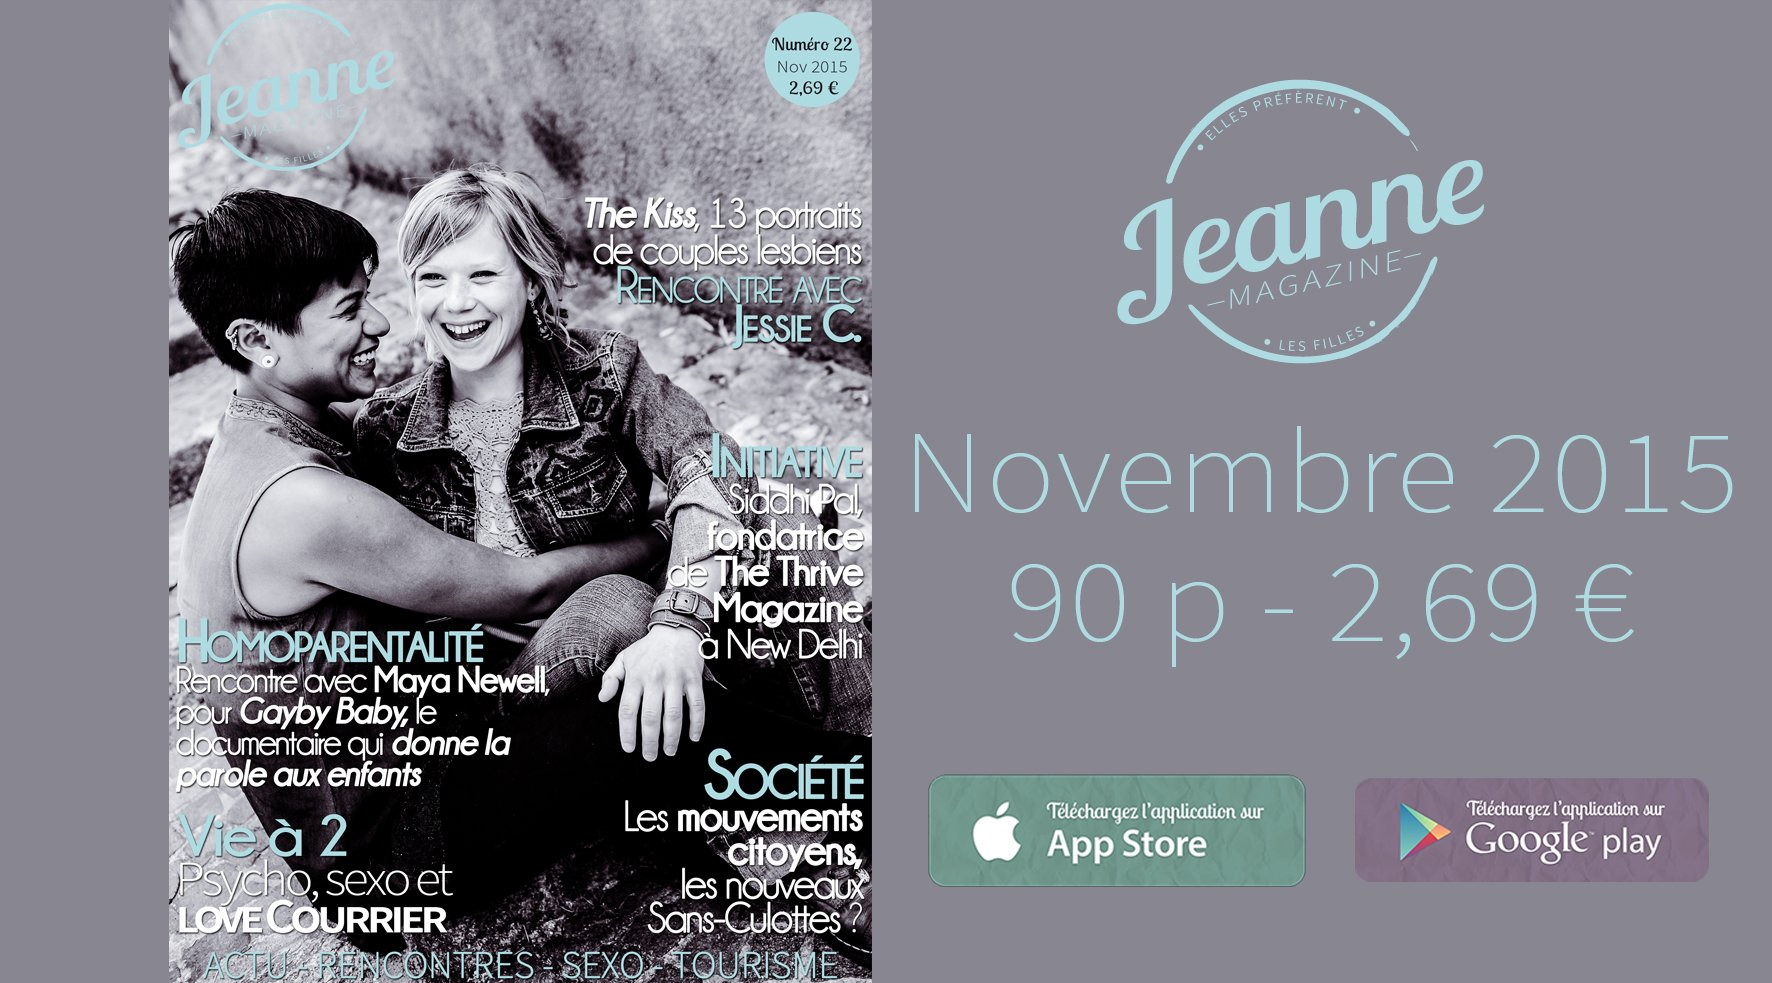 Sortie de Jeanne Magazine n°22 – novembre 2015